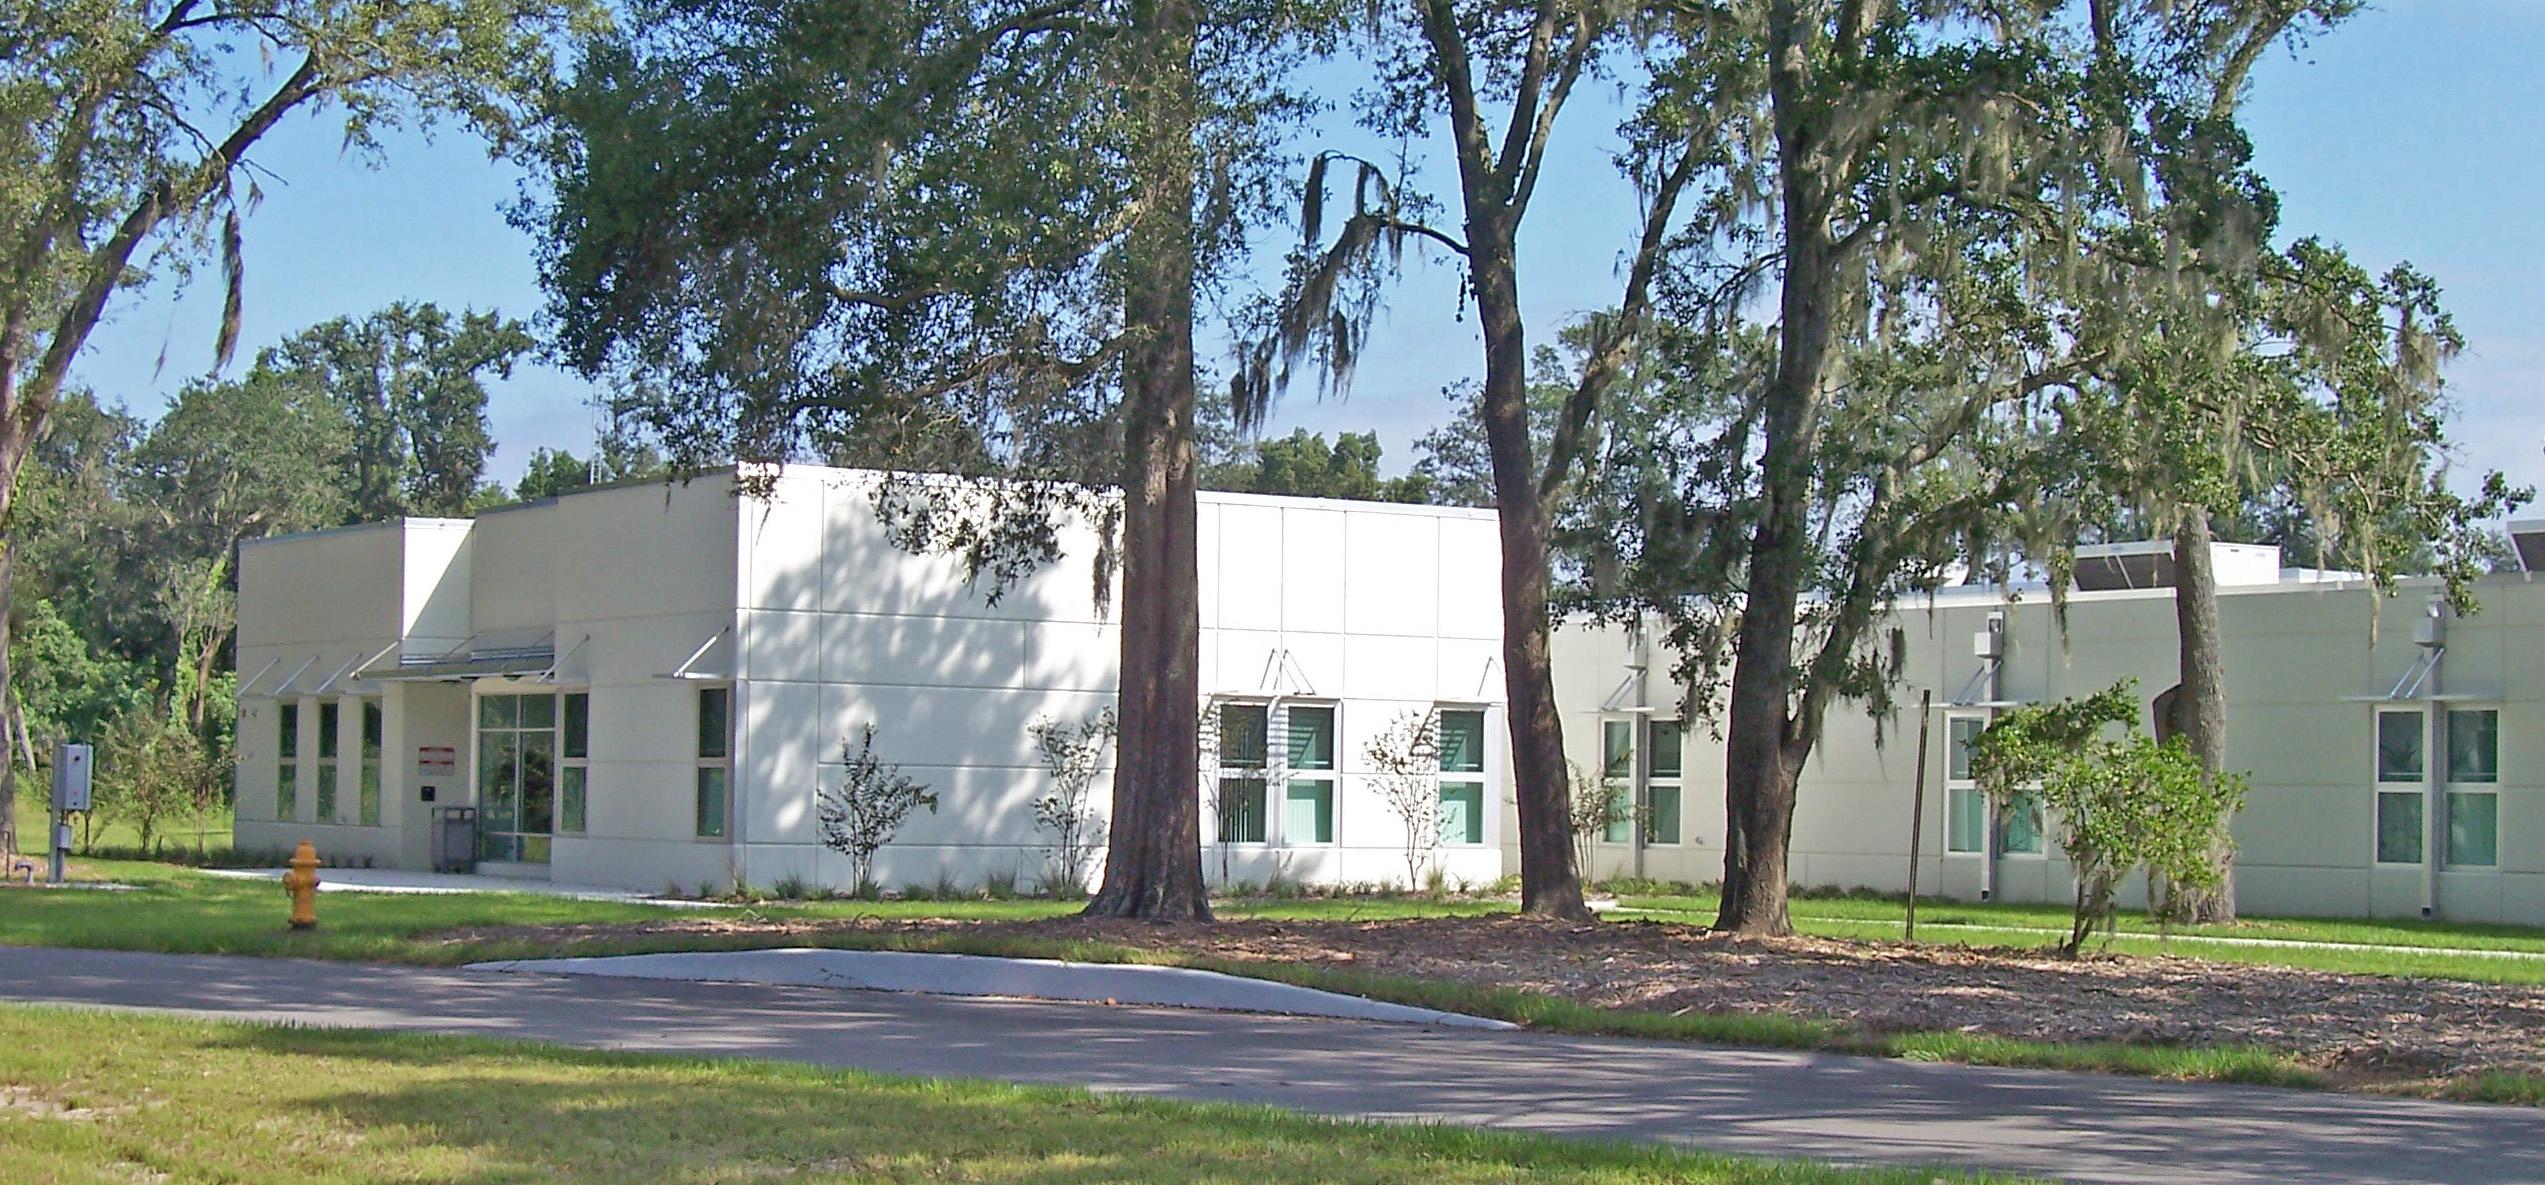 Aparicio-Levy Adult Education Center